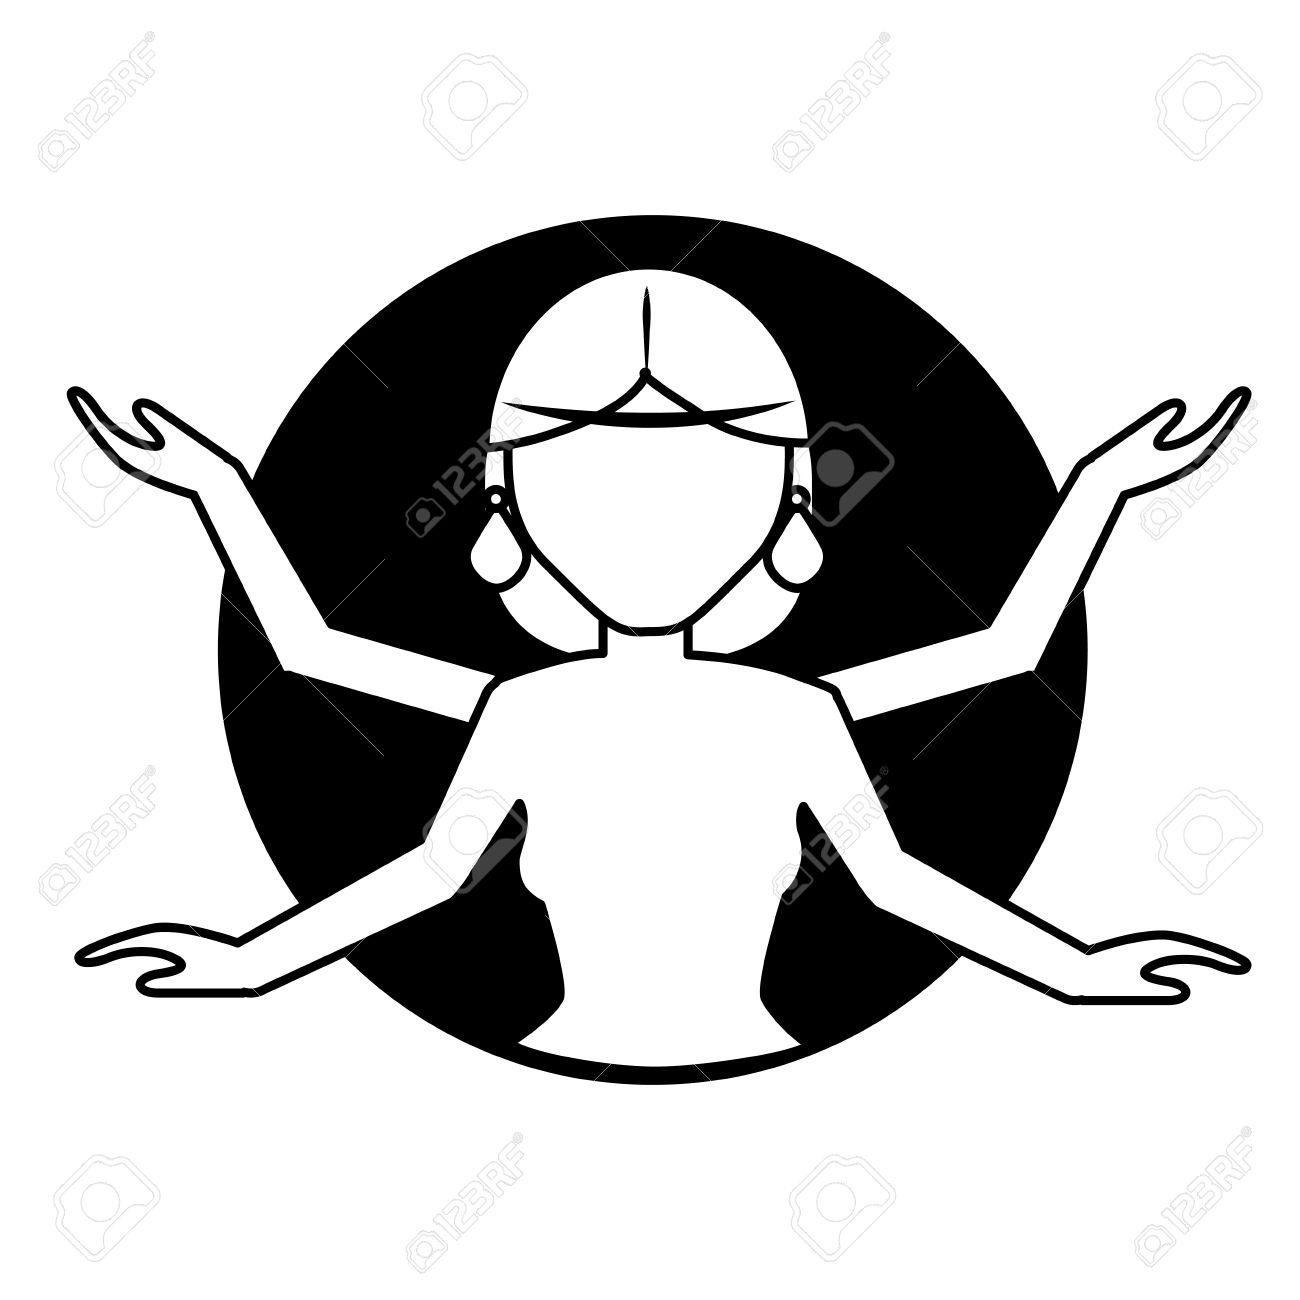 Shiva indian god icon vector illustration graphic design Stock Vector - 69562136